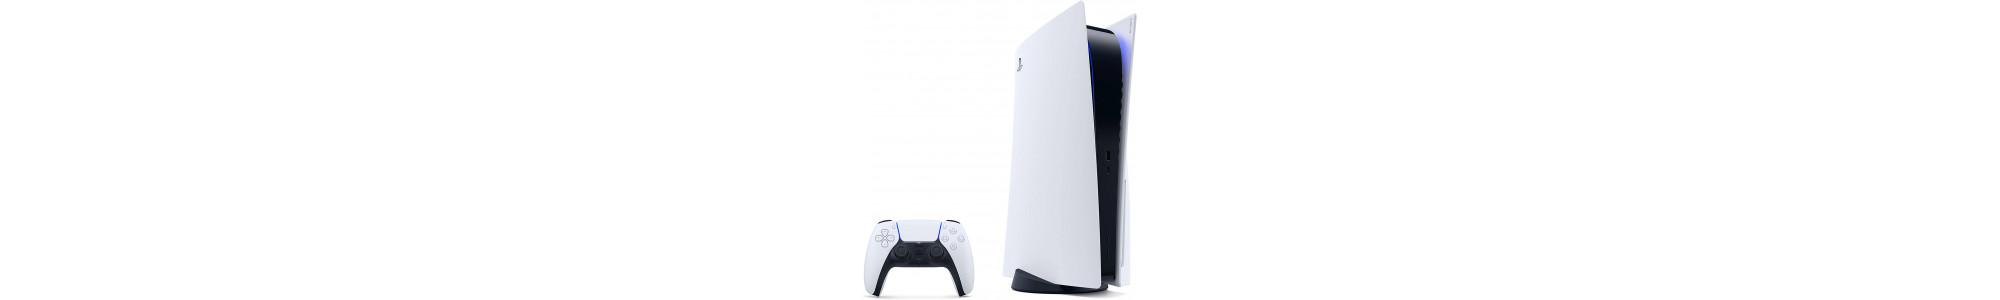 Приставки Sony Playstation 5